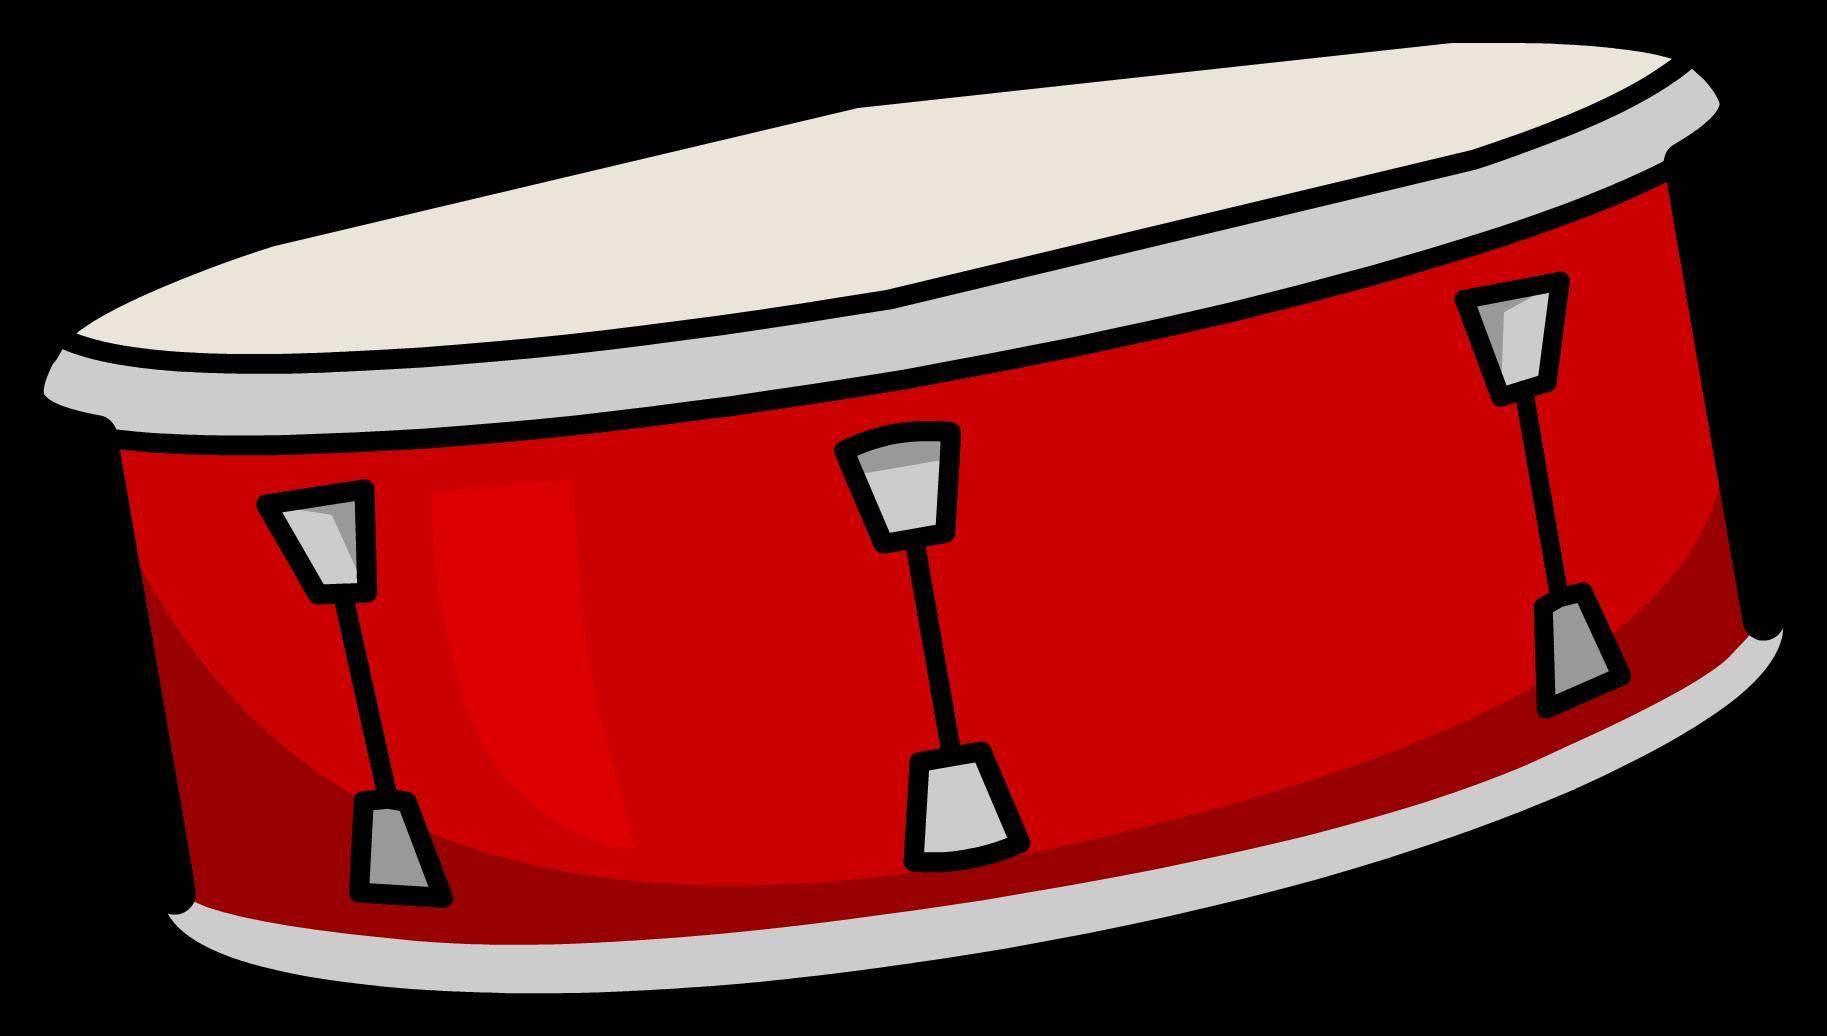 1827x1036 Snare Drum Club Penguin Wiki Fandom Powered By Wikia